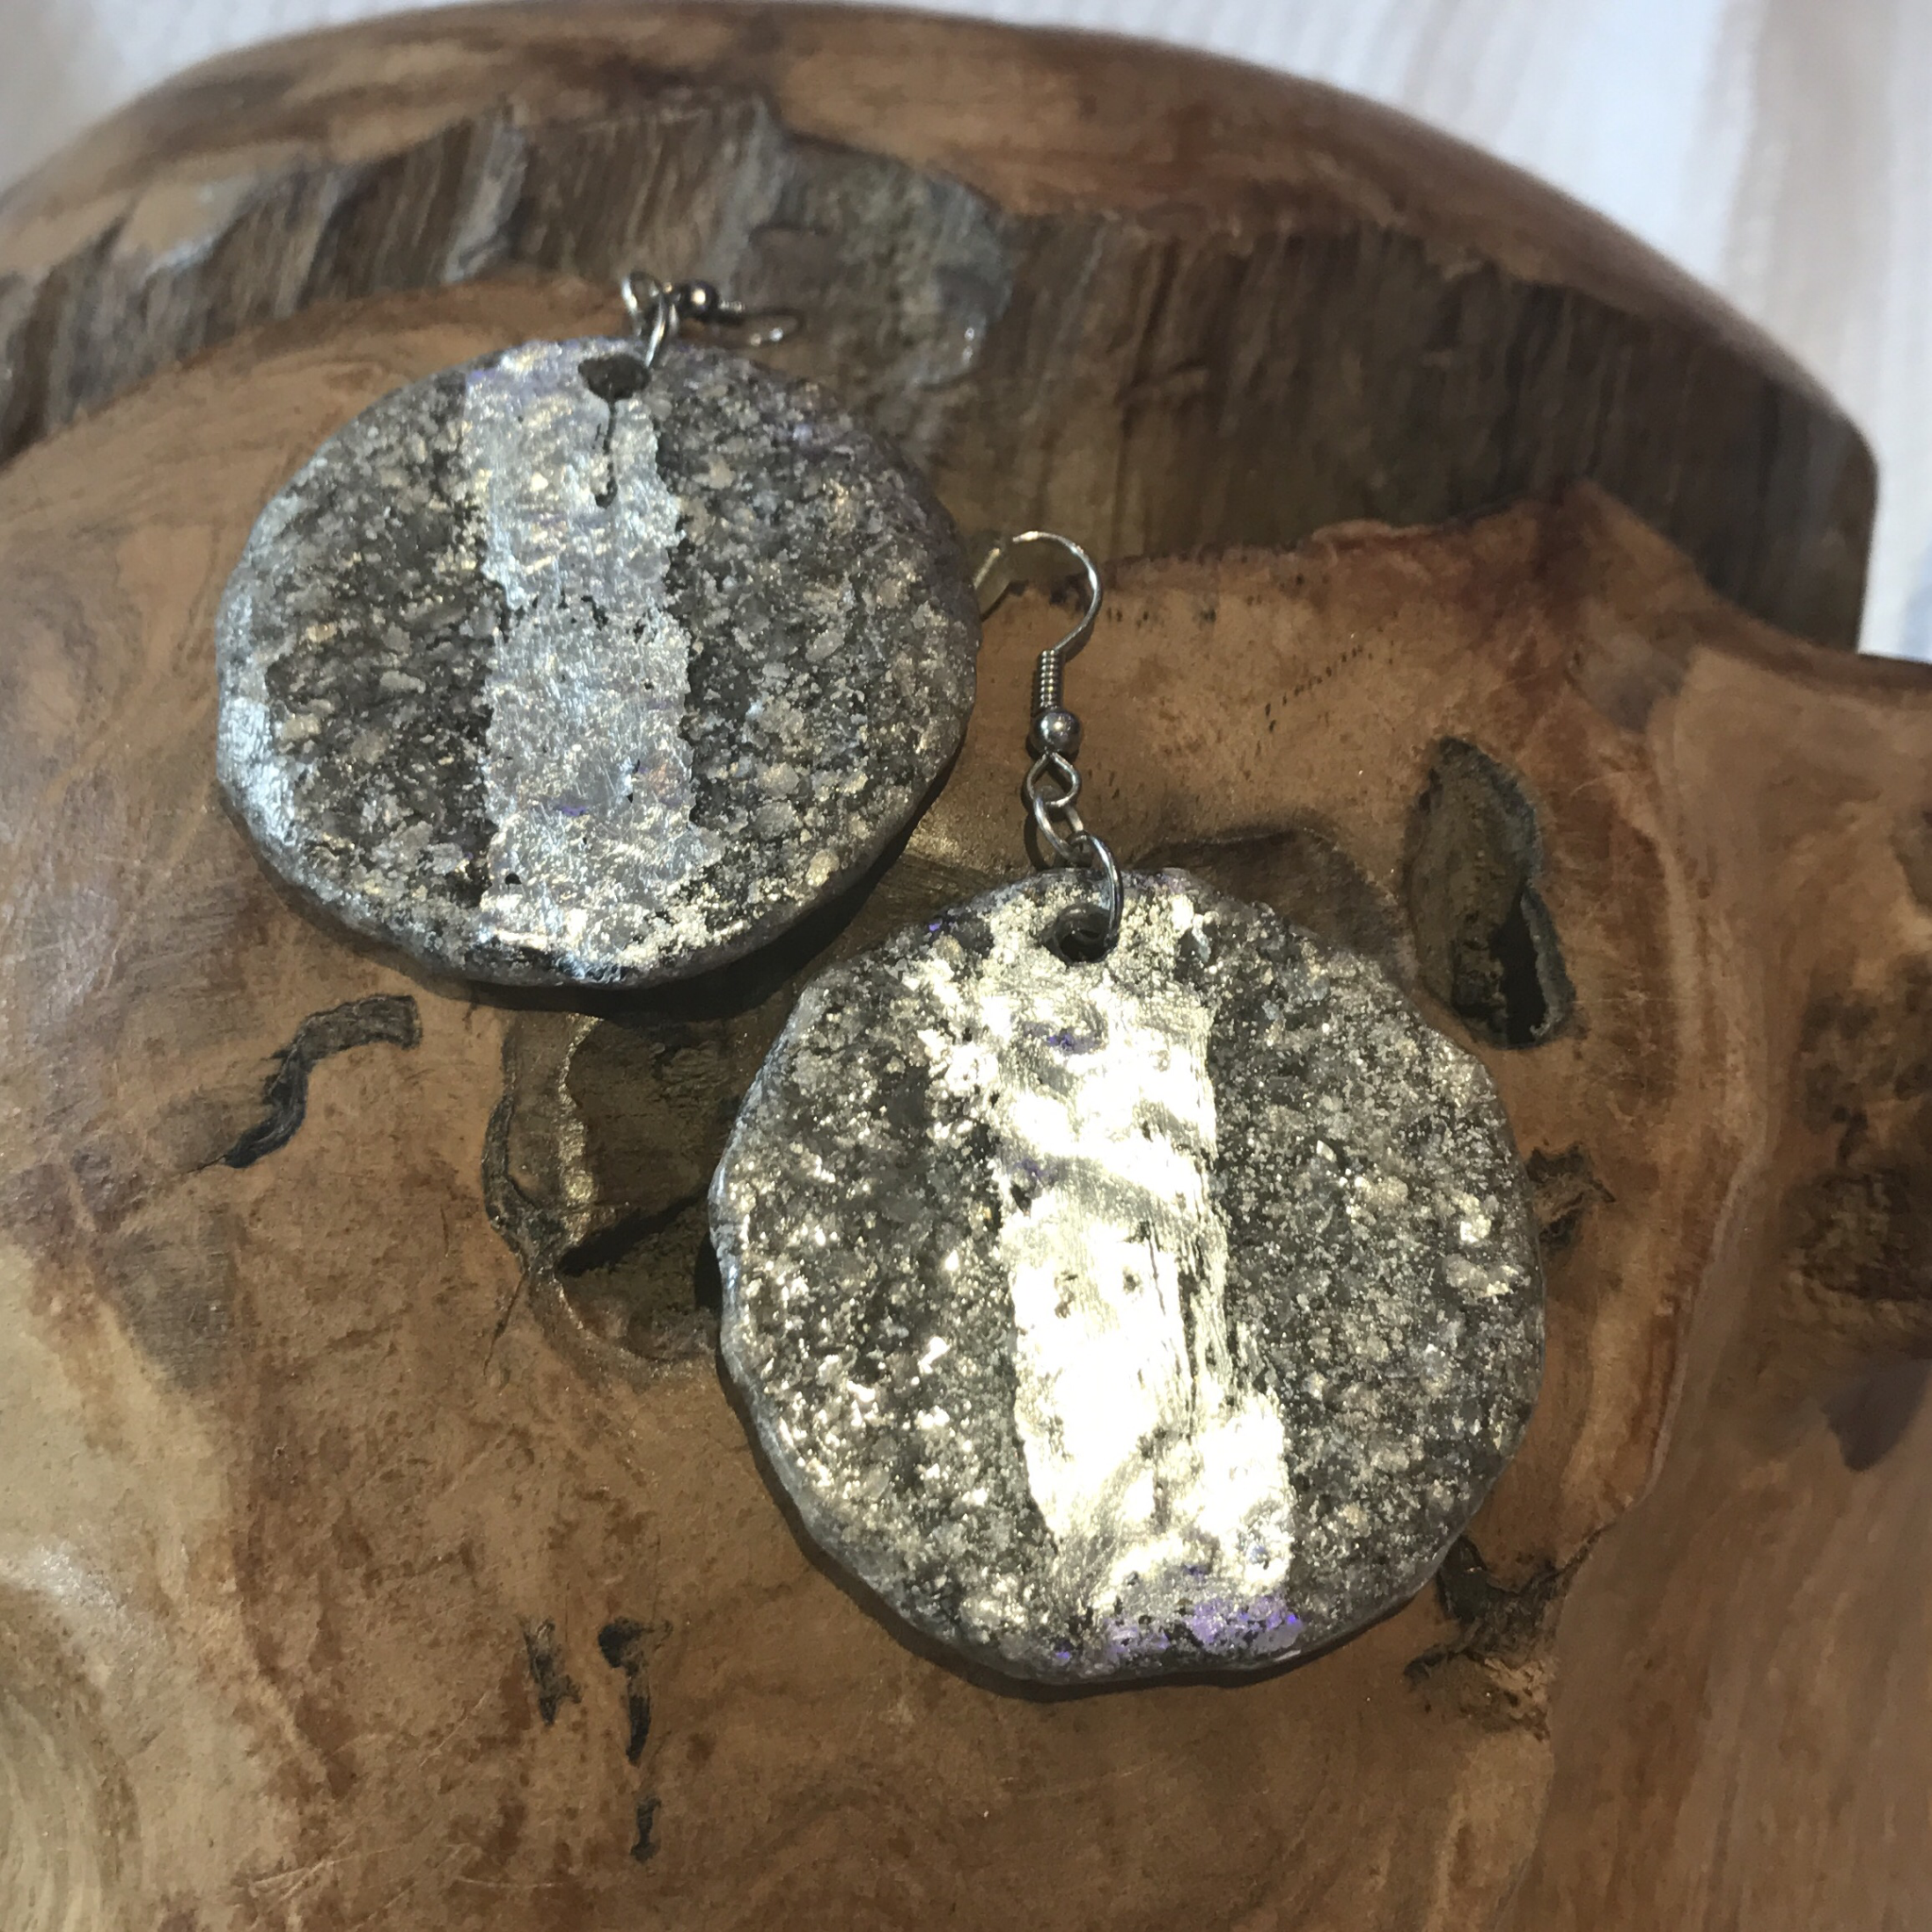 Ohrhänger silber mit Blattmetall - Rückseite silber granuliert - beidseitig tragbar 00025